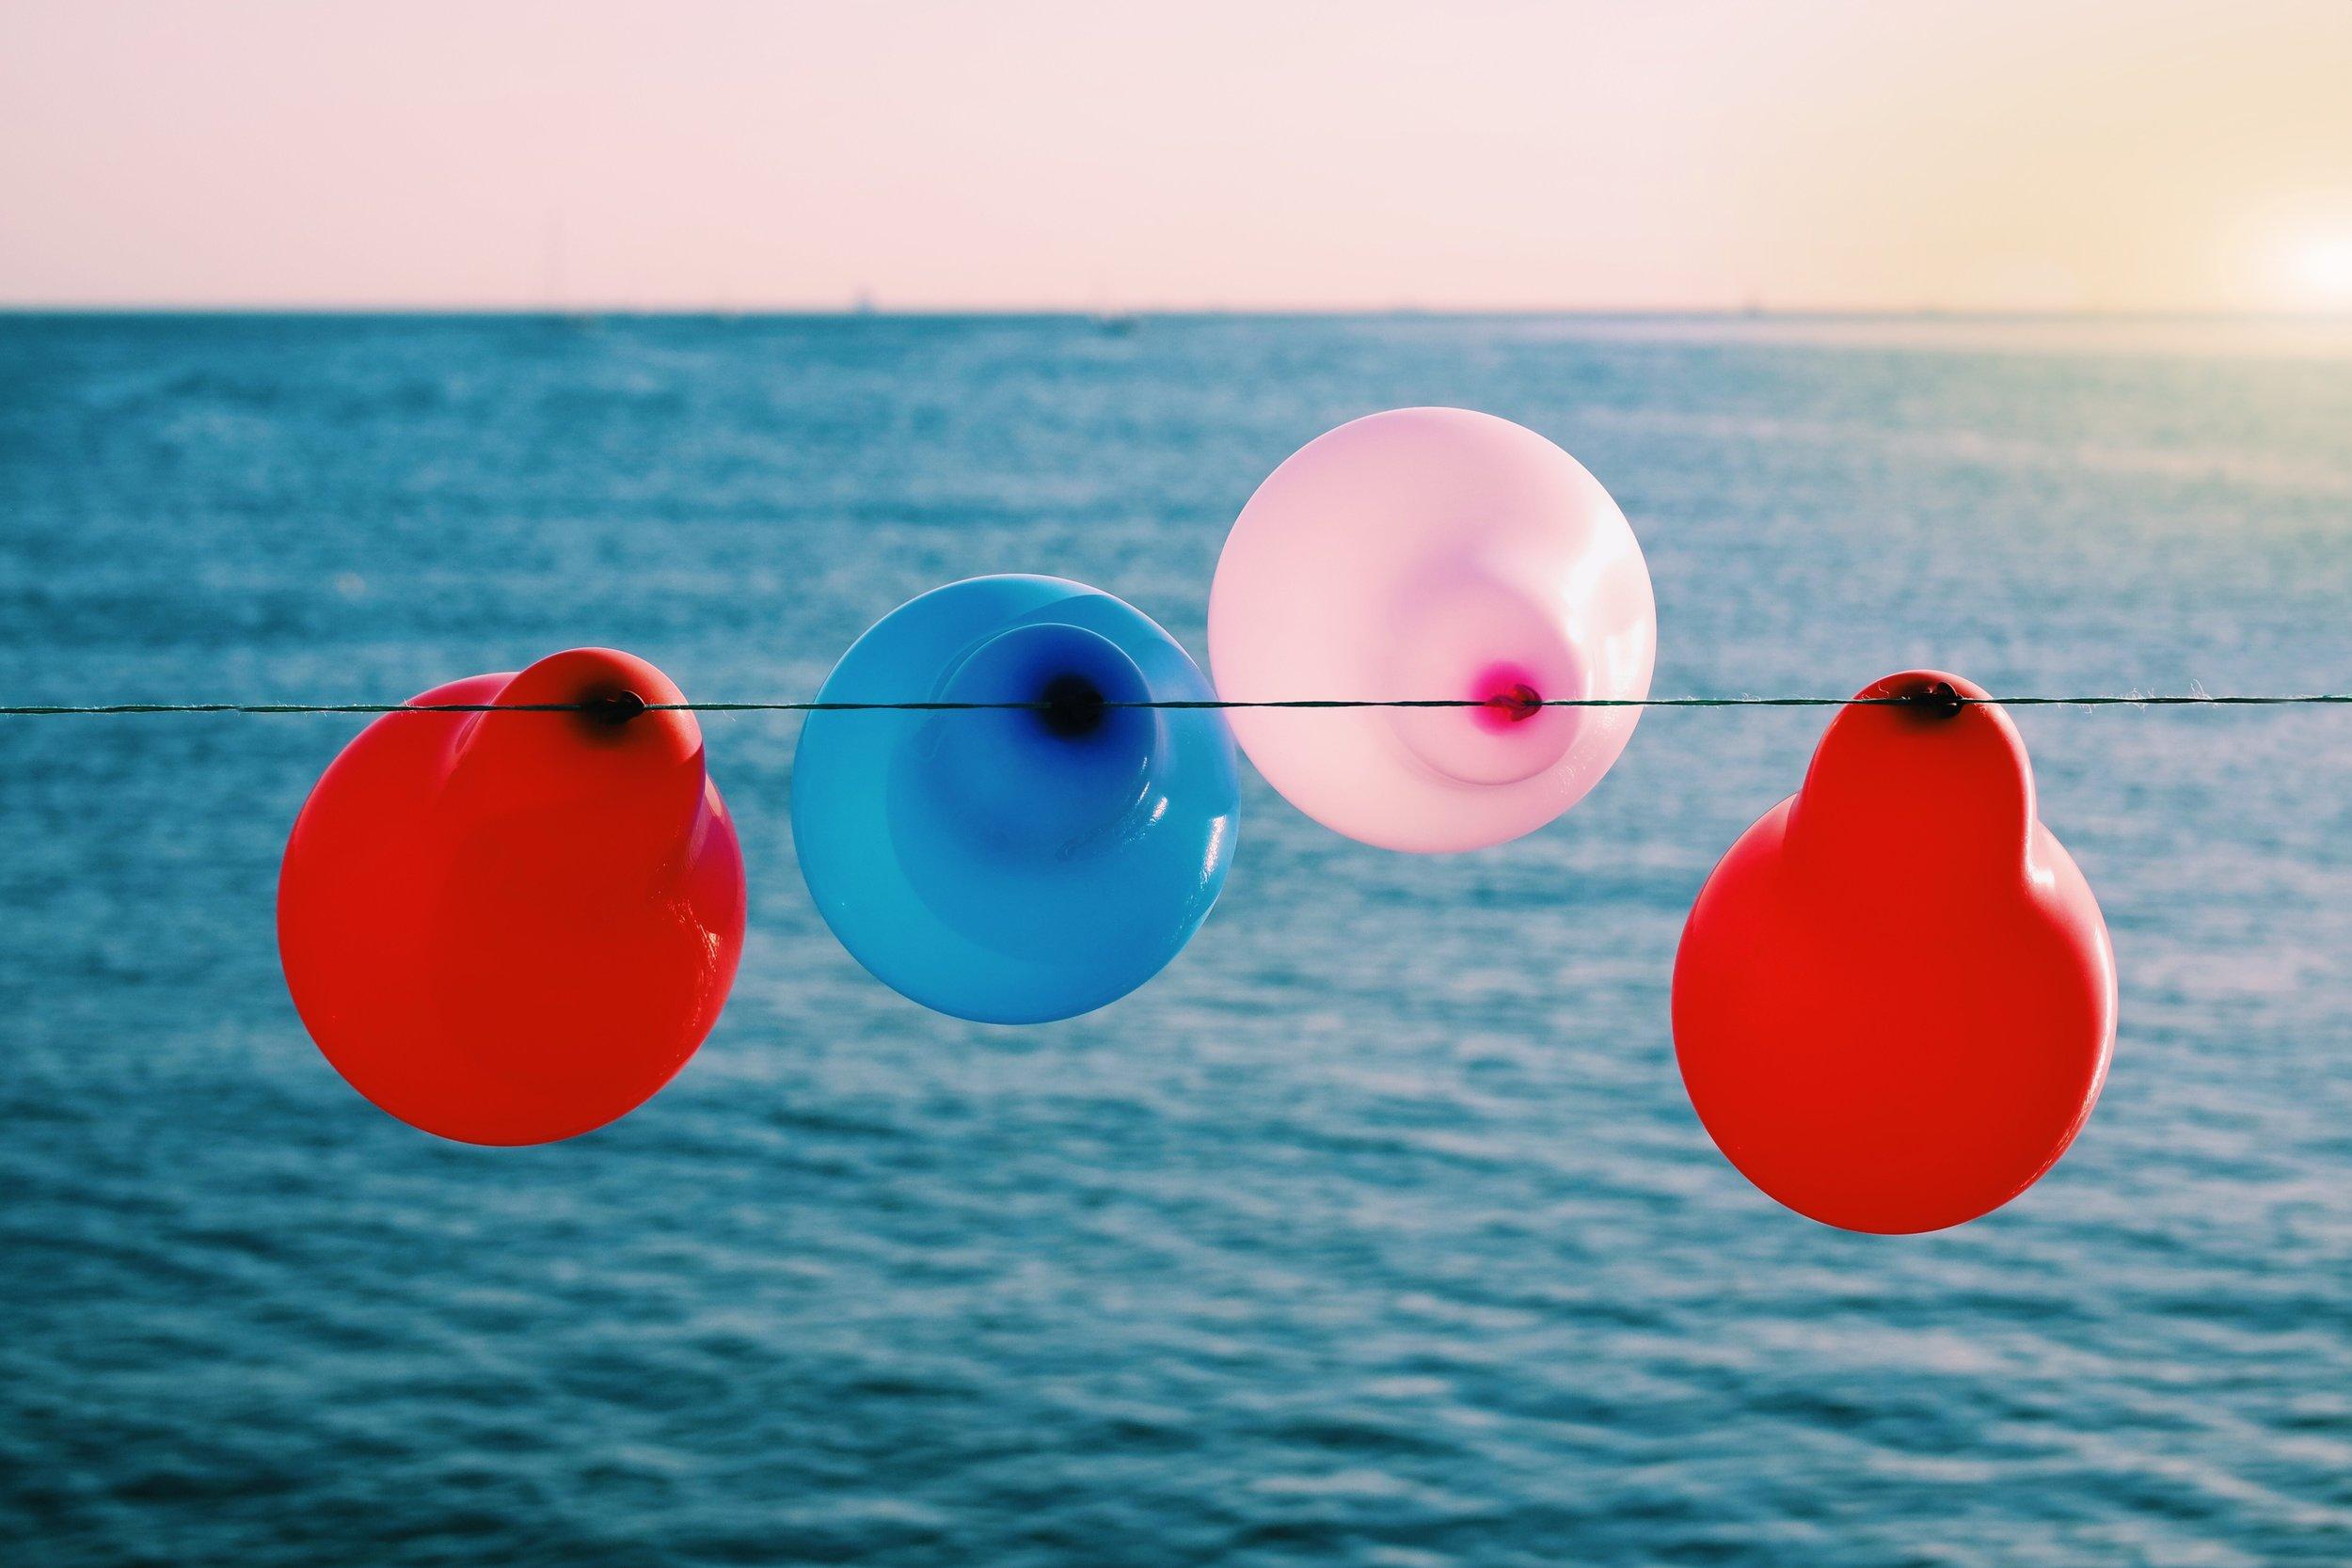 anniversary-balloons-birthday-68369.jpg